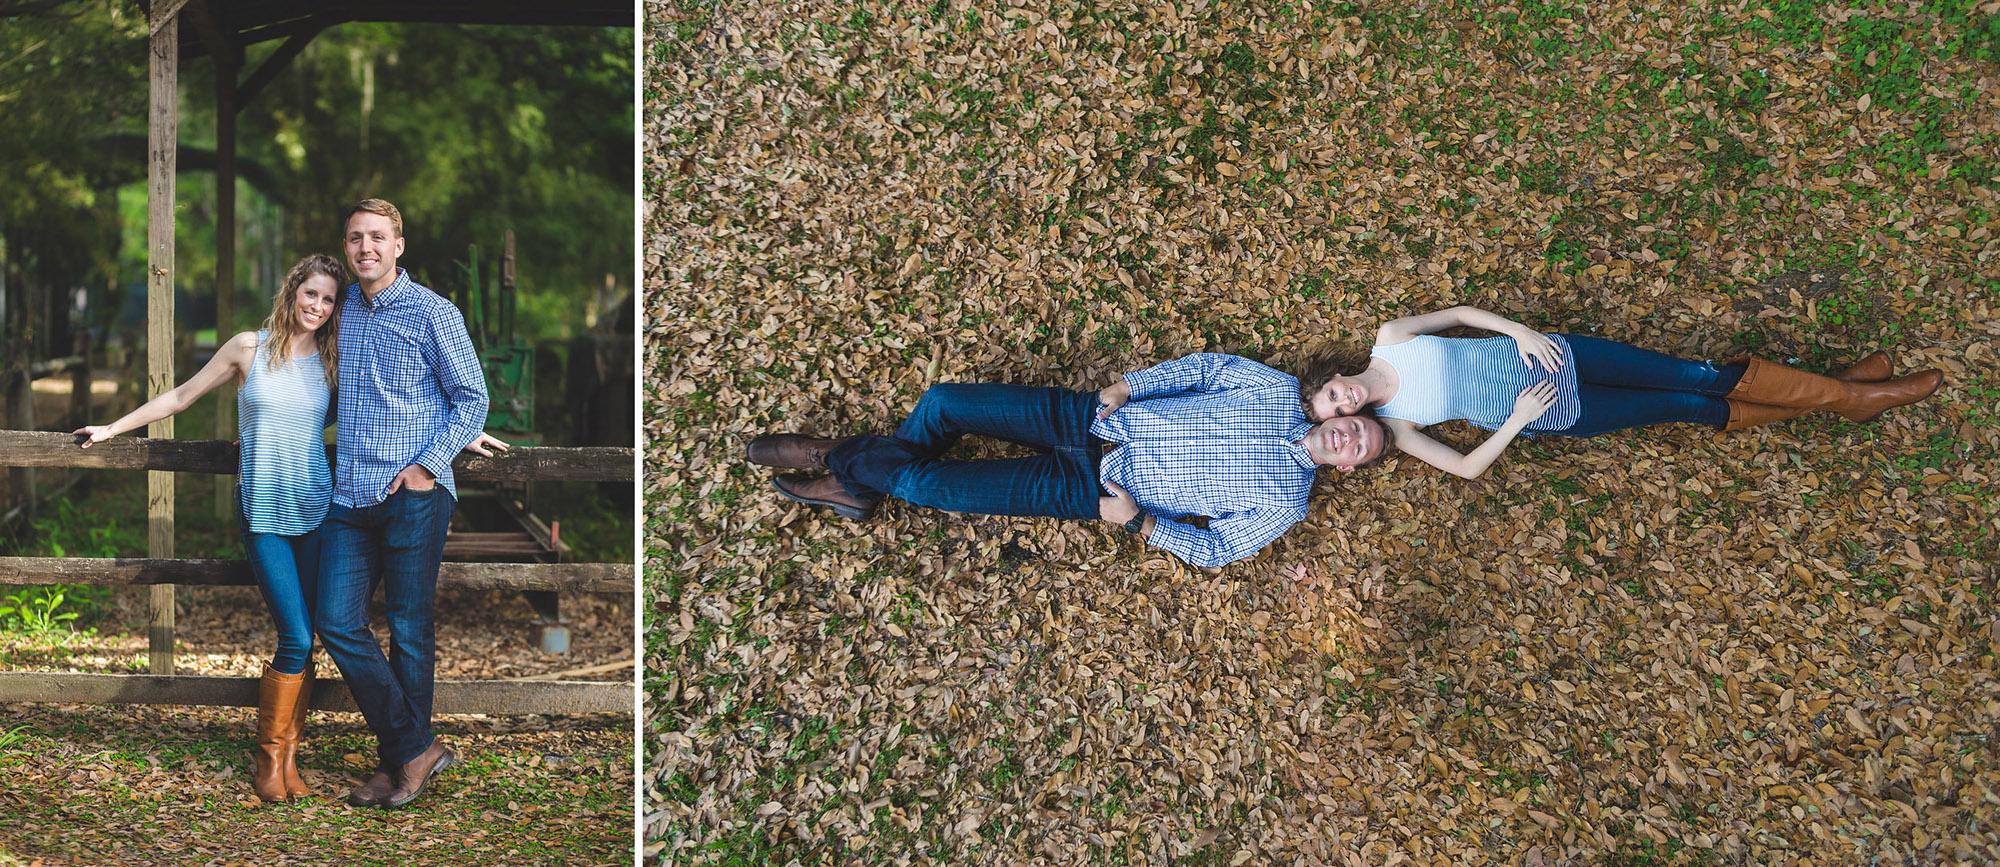 adam-szarmack-Walter-Jones-Historical-Park-engagement-1.jpg